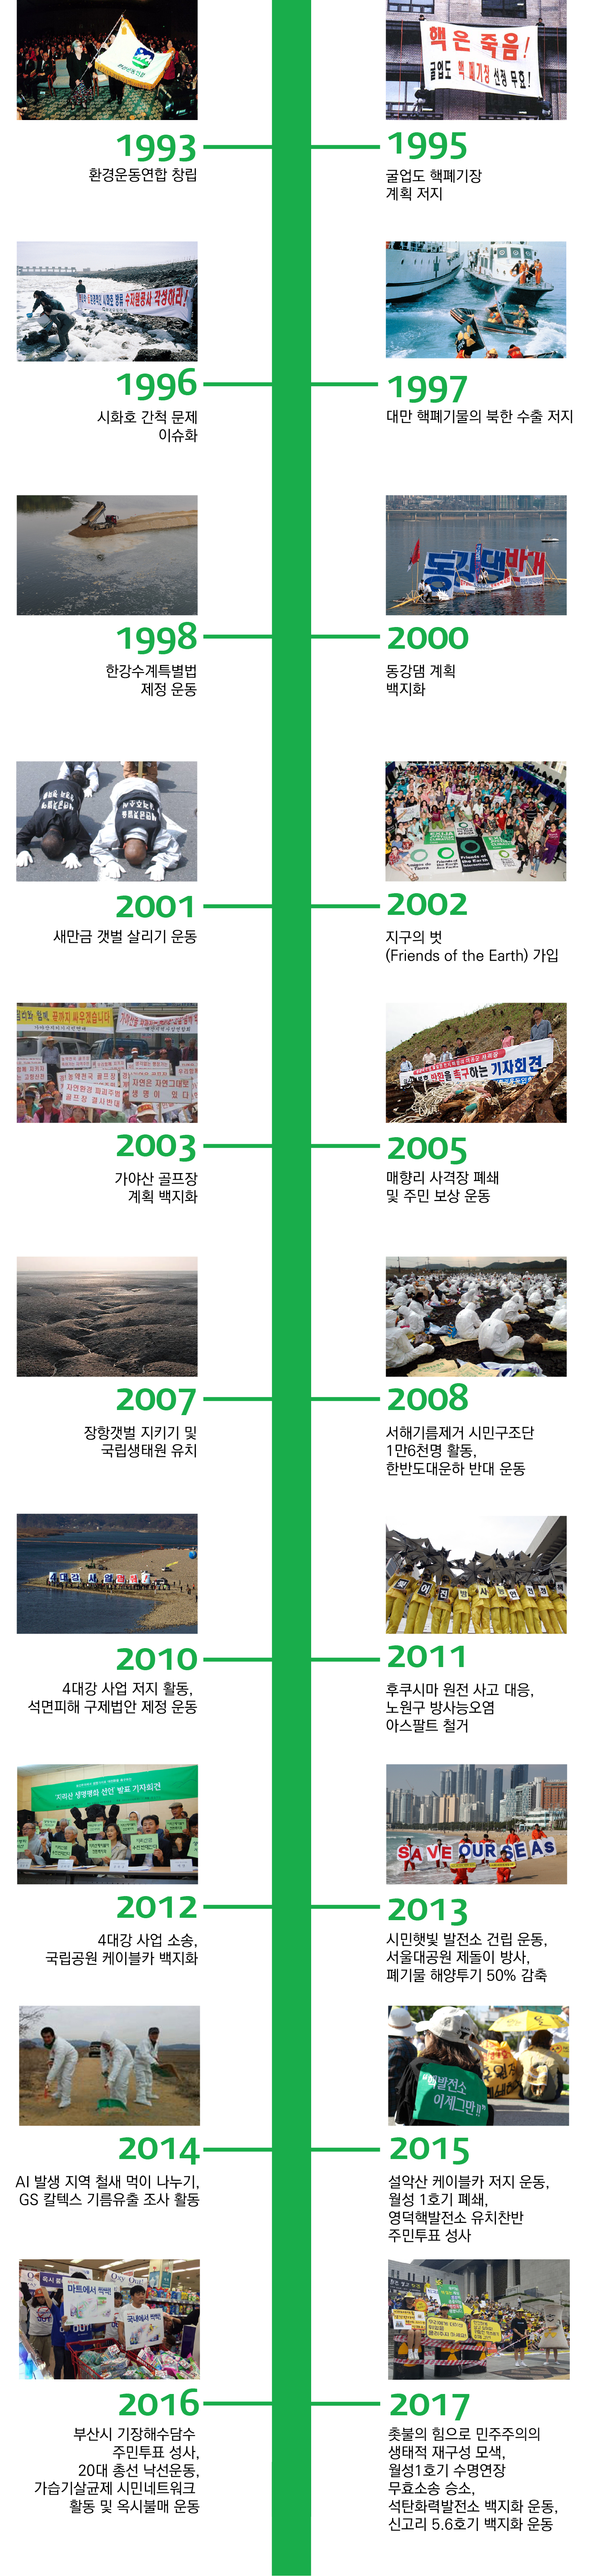 history_m2